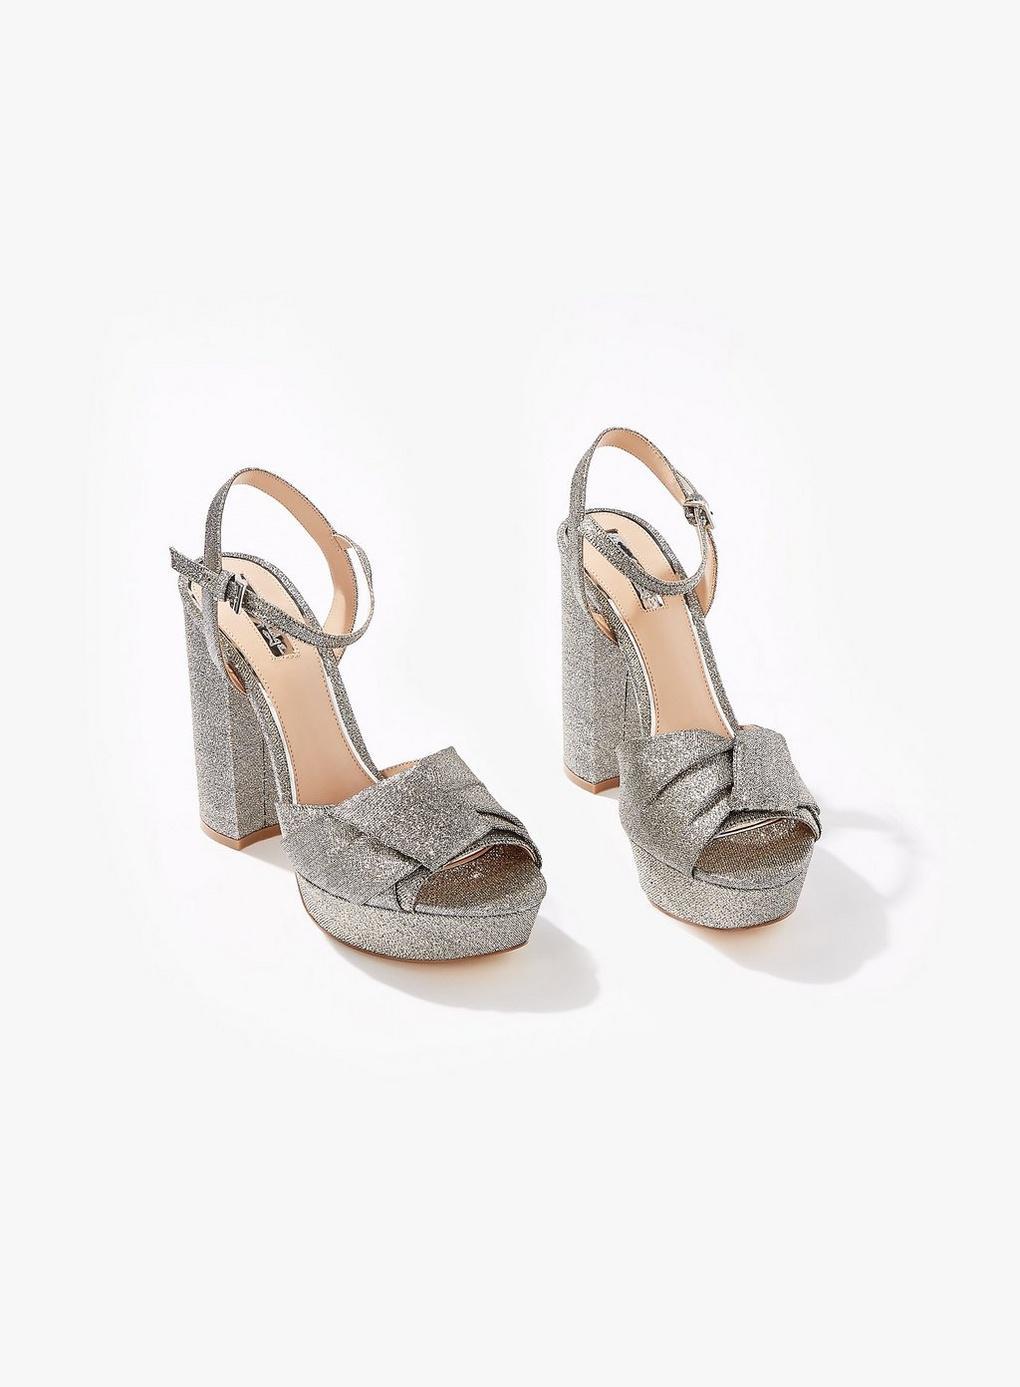 511408ec311 Miss Selfridge Silver Crystal Platform Sandals in Metallic - Lyst